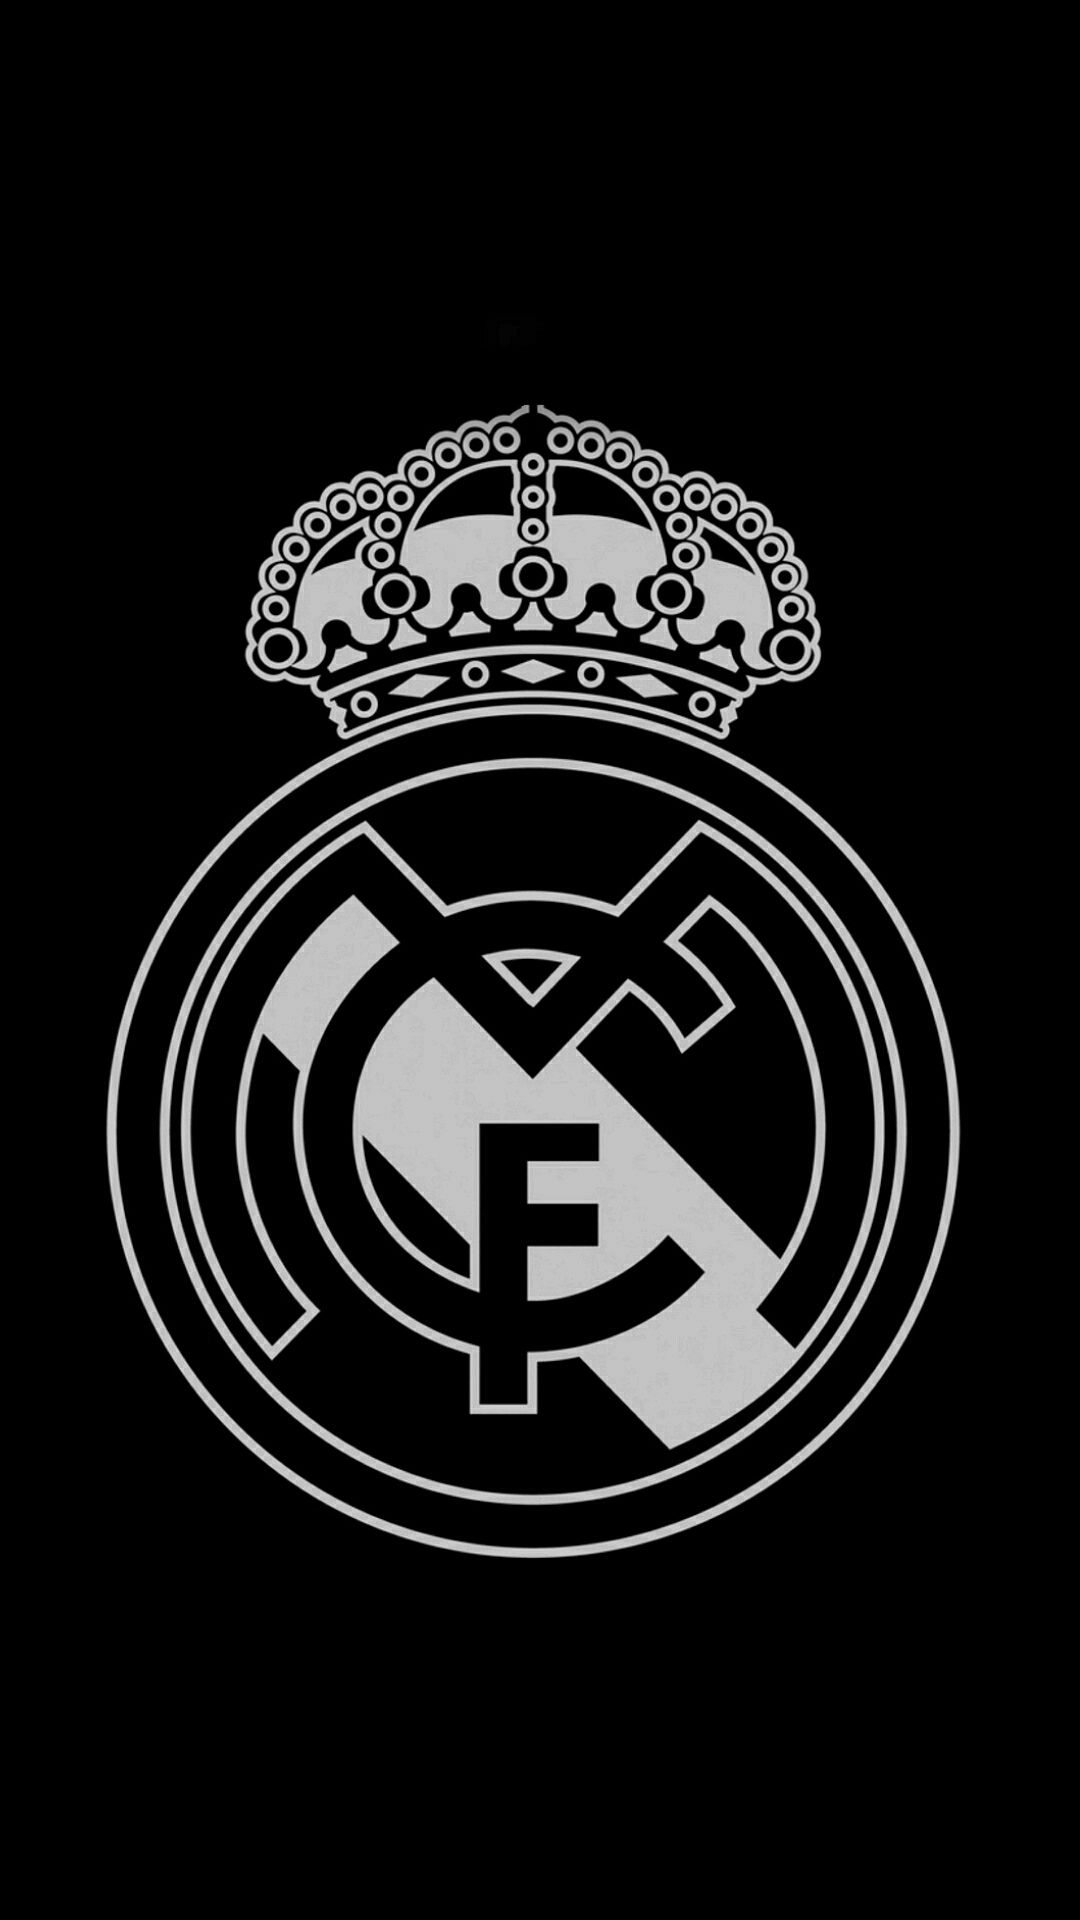 Pin De Muhab Yassin En Sports Fondos De Pantalla Real Madrid Fondos Del Real Madrid Logotipo Del Real Madrid